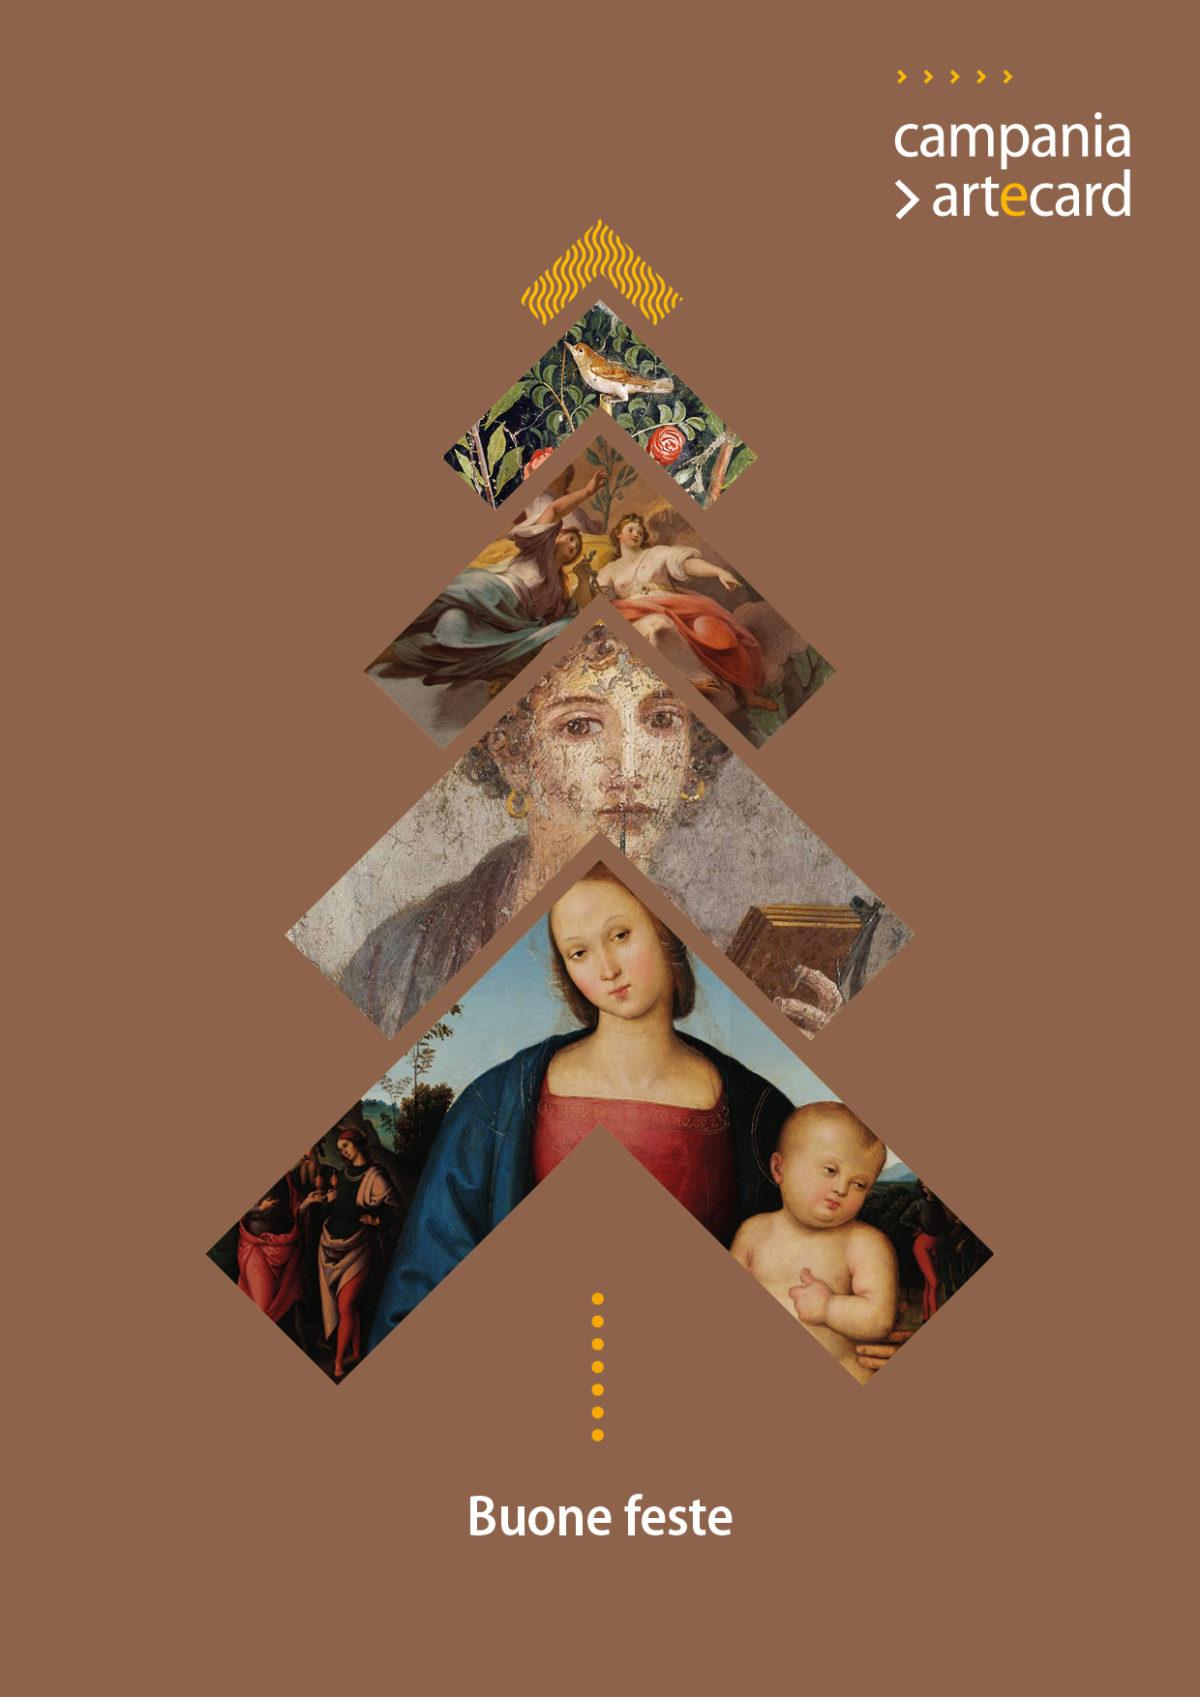 Sostieni la cultura, Natale ed Artecard